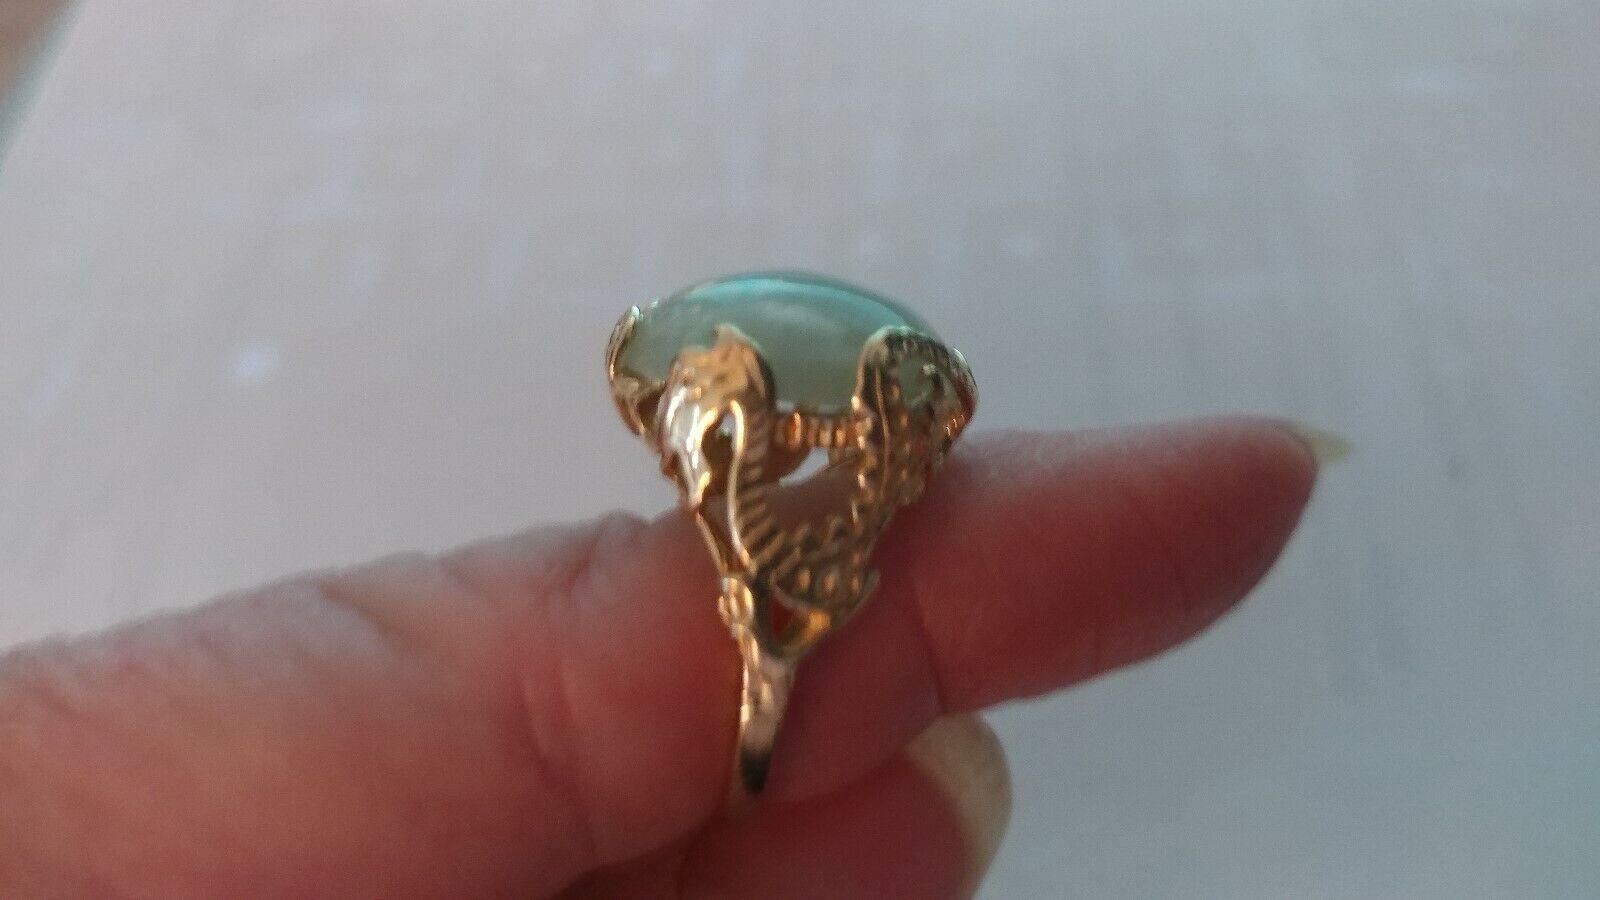 14 Kt Yellow gold Jade Cabochon Ring - Size 6-3 4 - Beautiful Setting